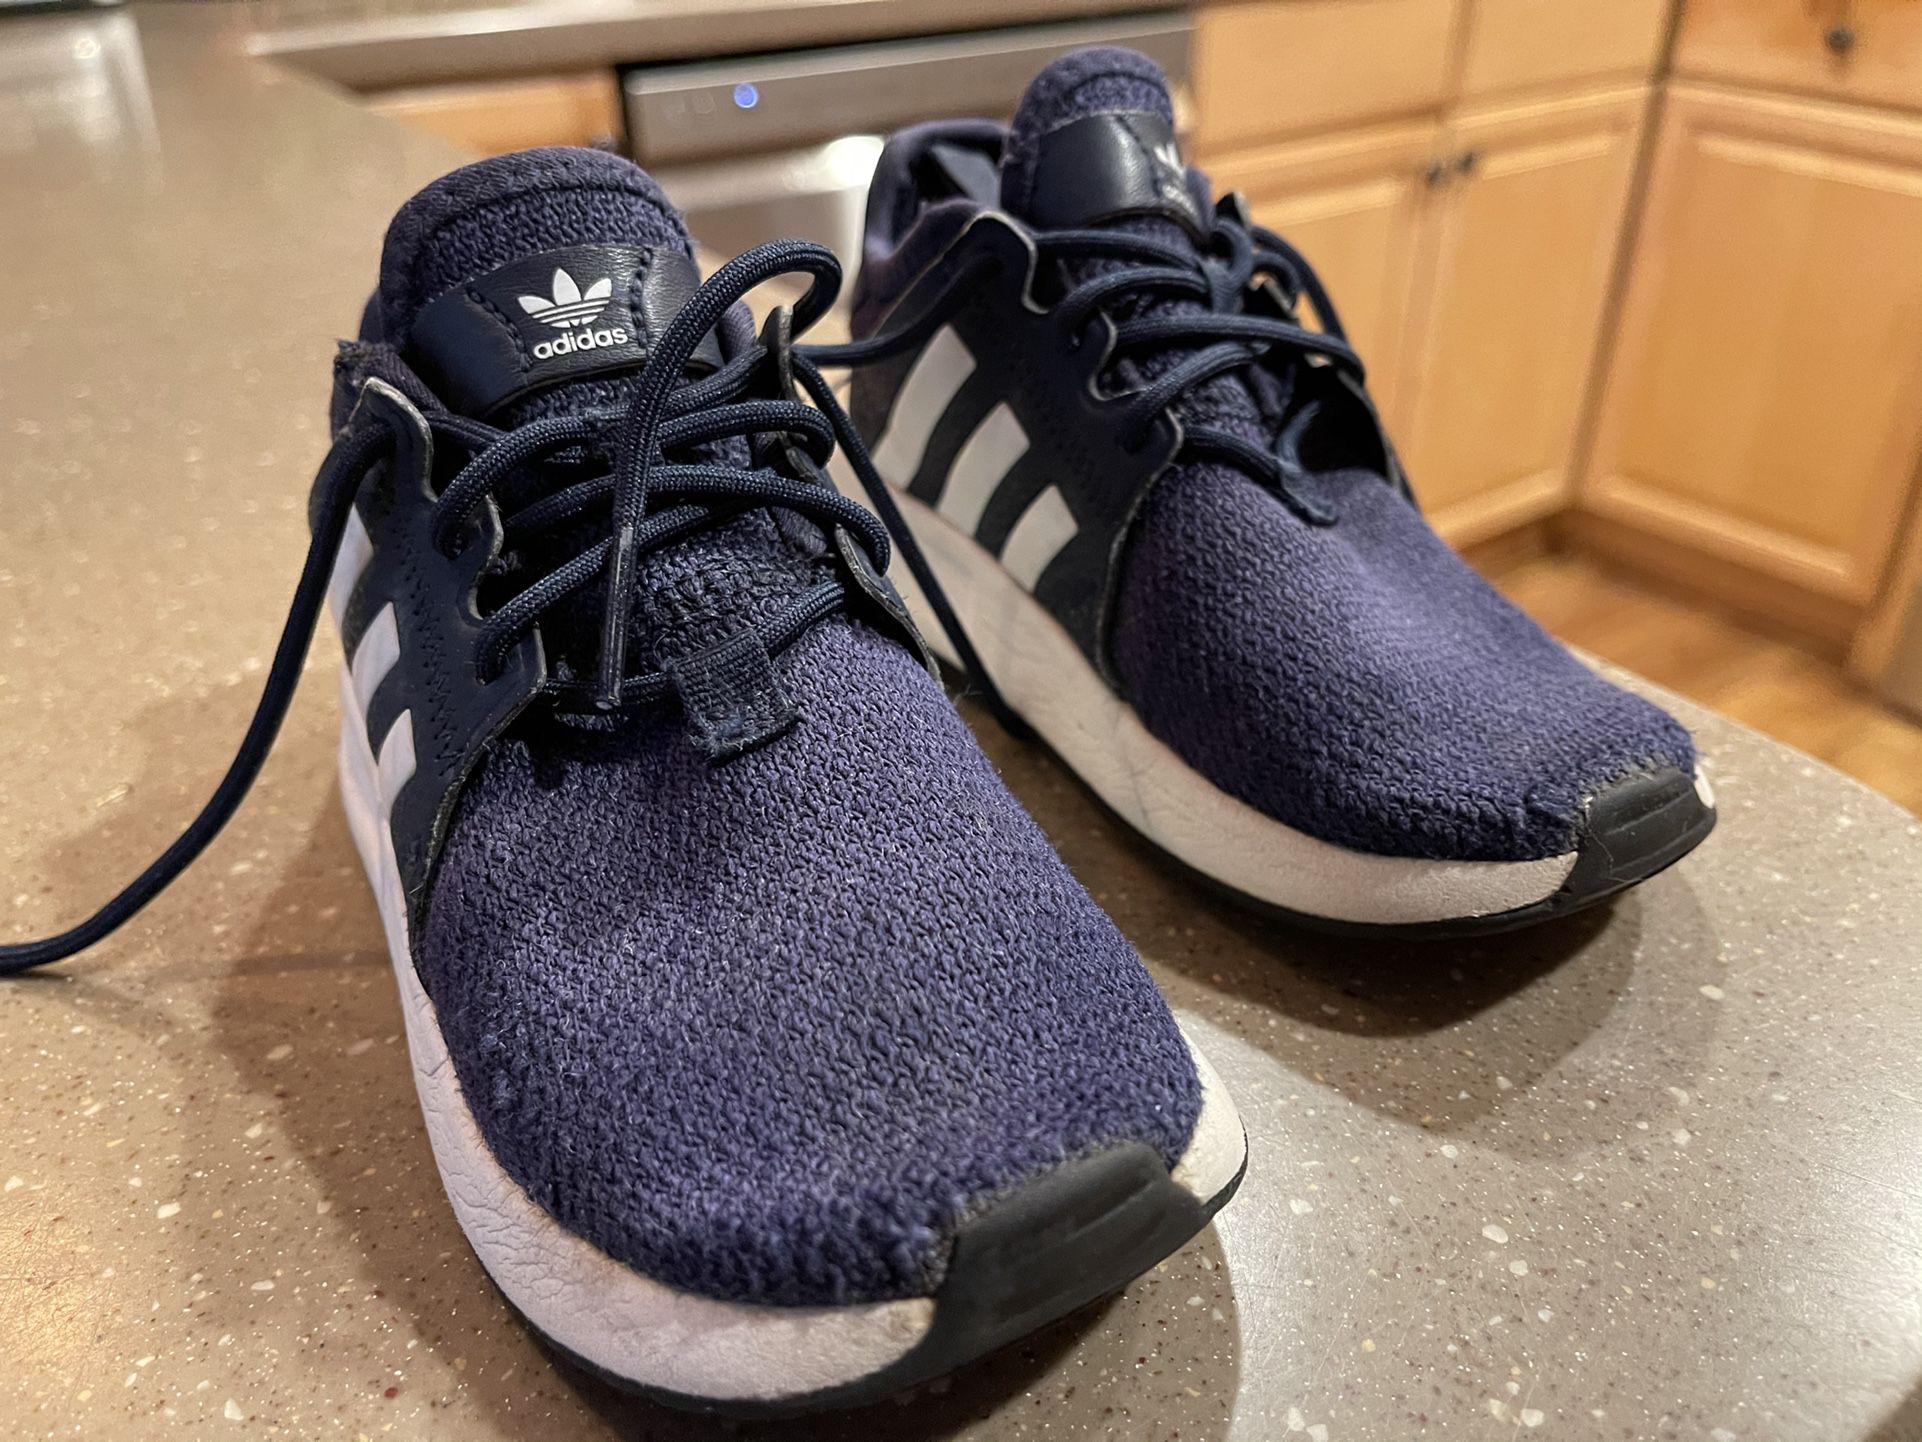 Kids Shoes (Adidas)